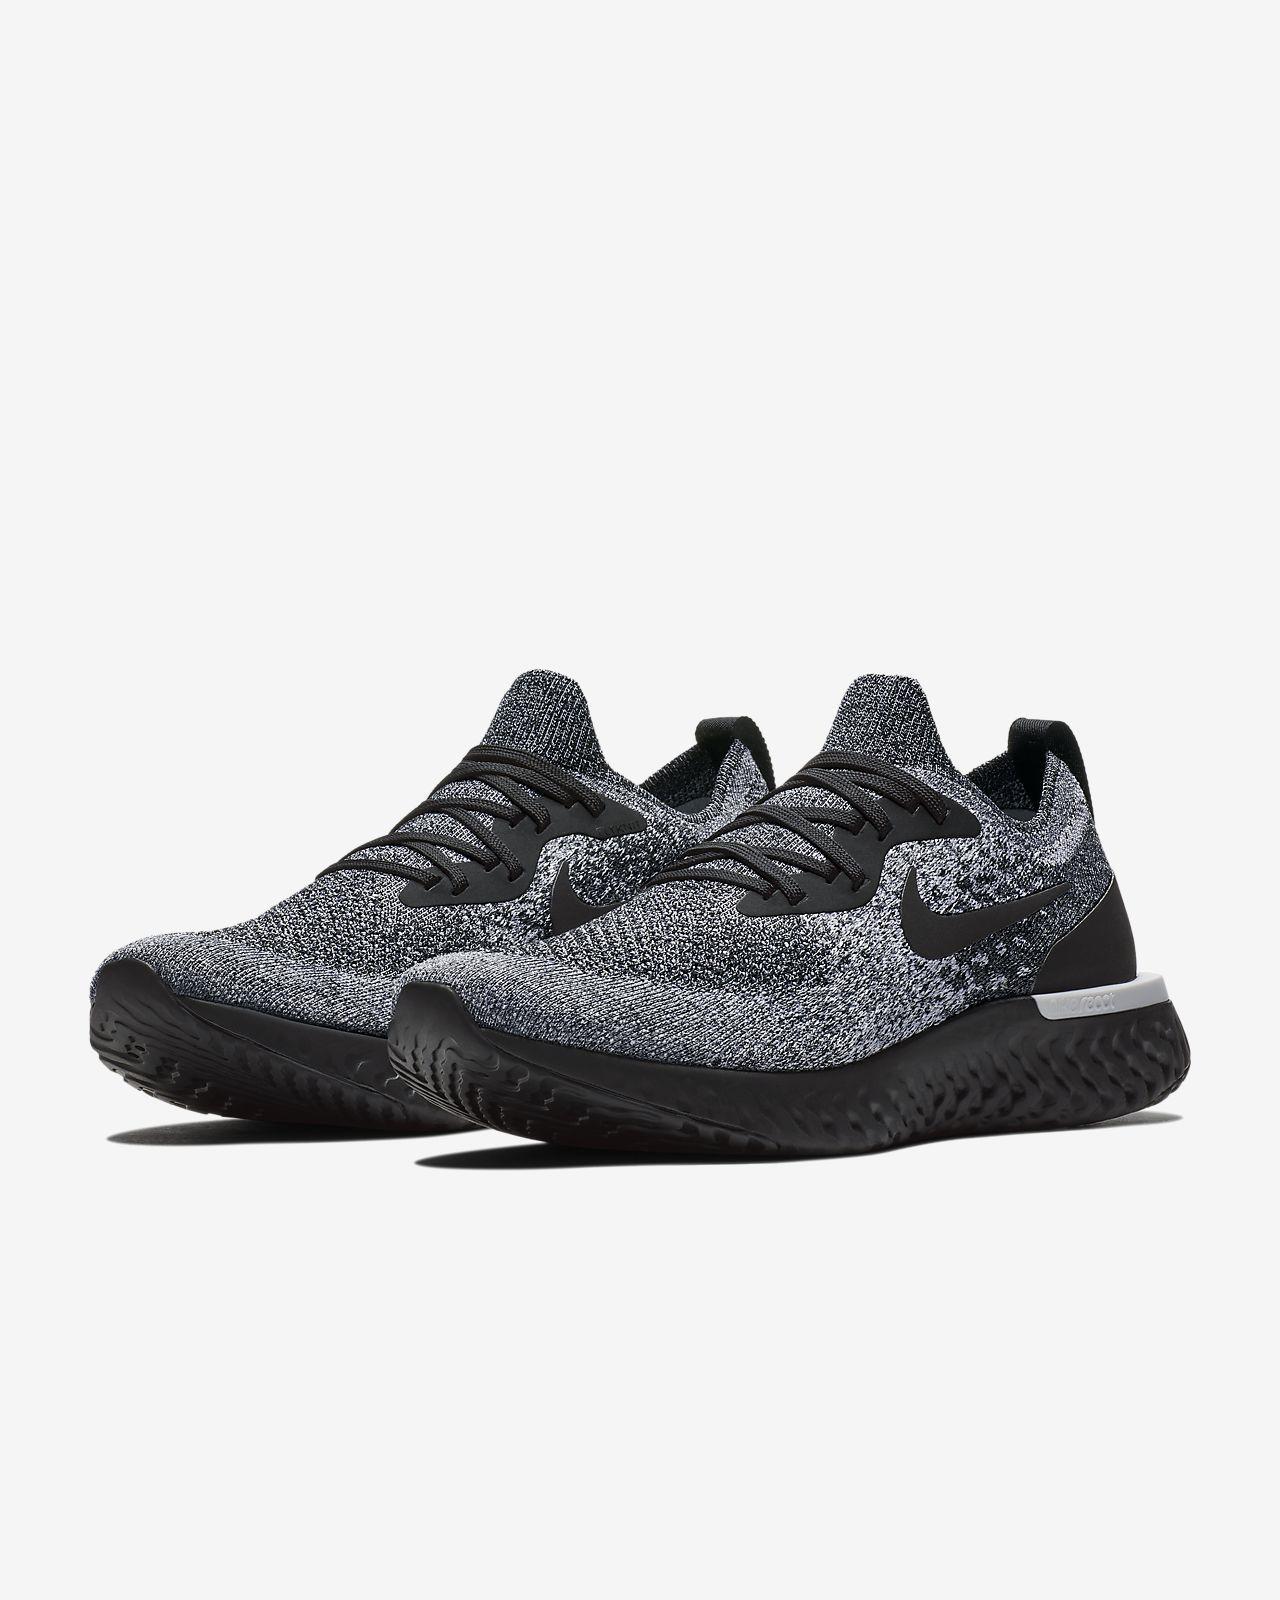 Desgracia Restricciones Moderar  Nike Epic React Flyknit 1 Men's Running Shoe. Nike AU | Running shoes for  men, Nike shoes women, Womens running shoes